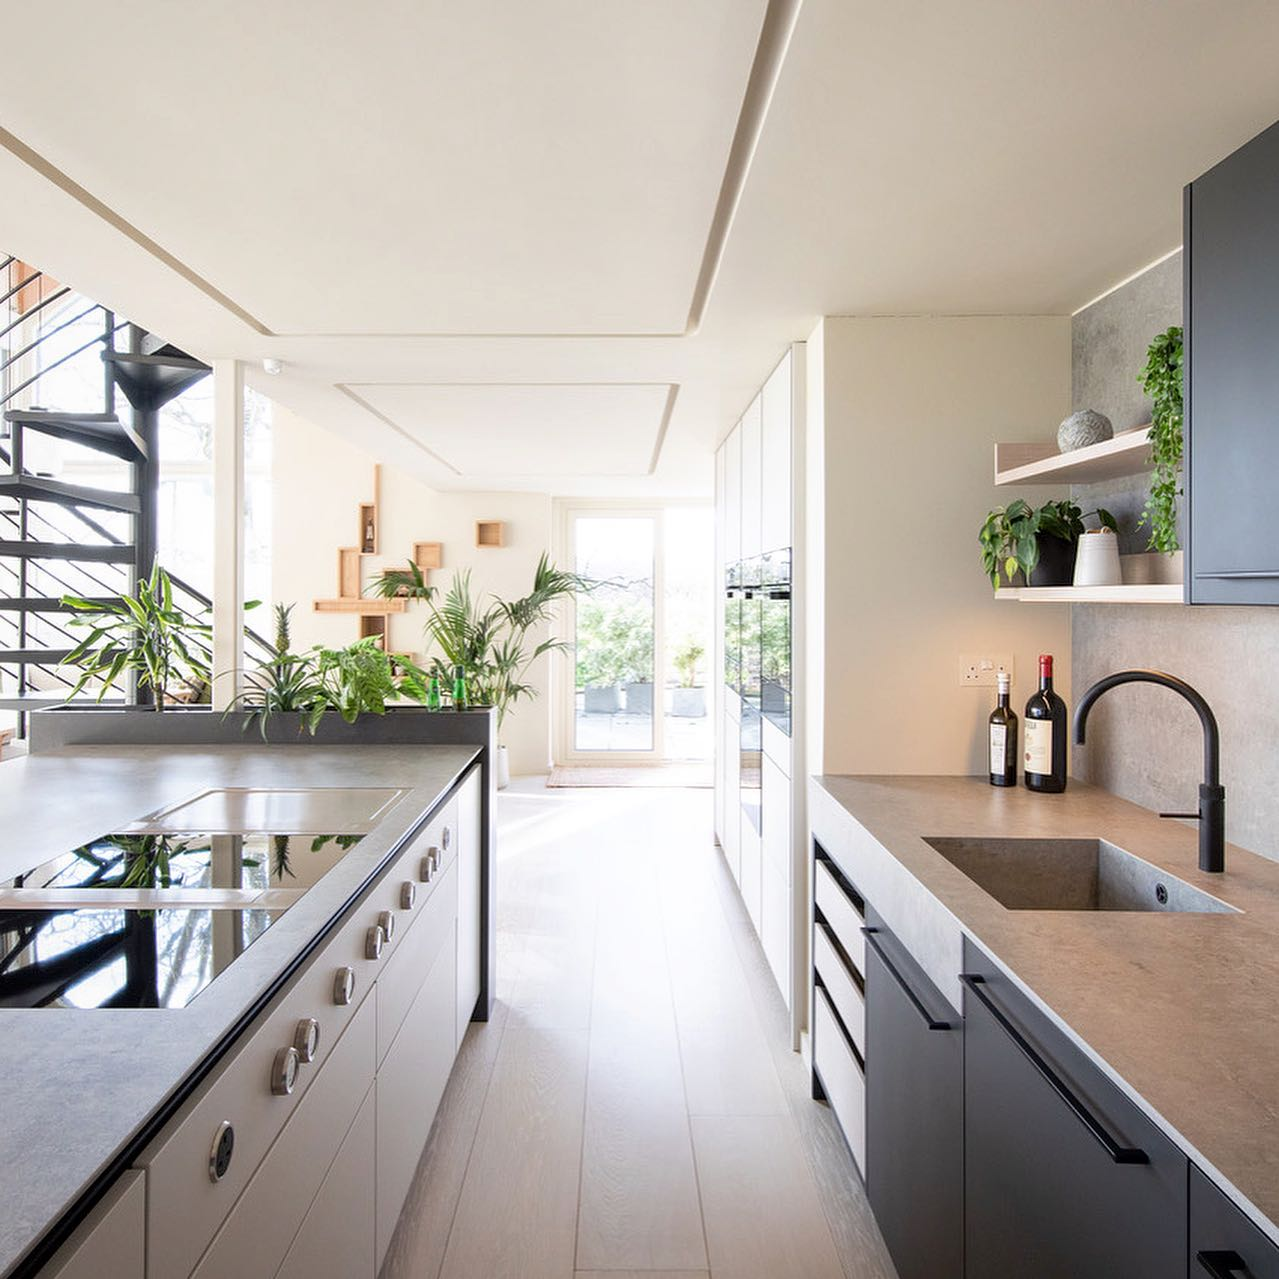 Kreta Dekton Kitchen Worktop Light Grey, dark grey kitchen cabinets and Dekton clad planter